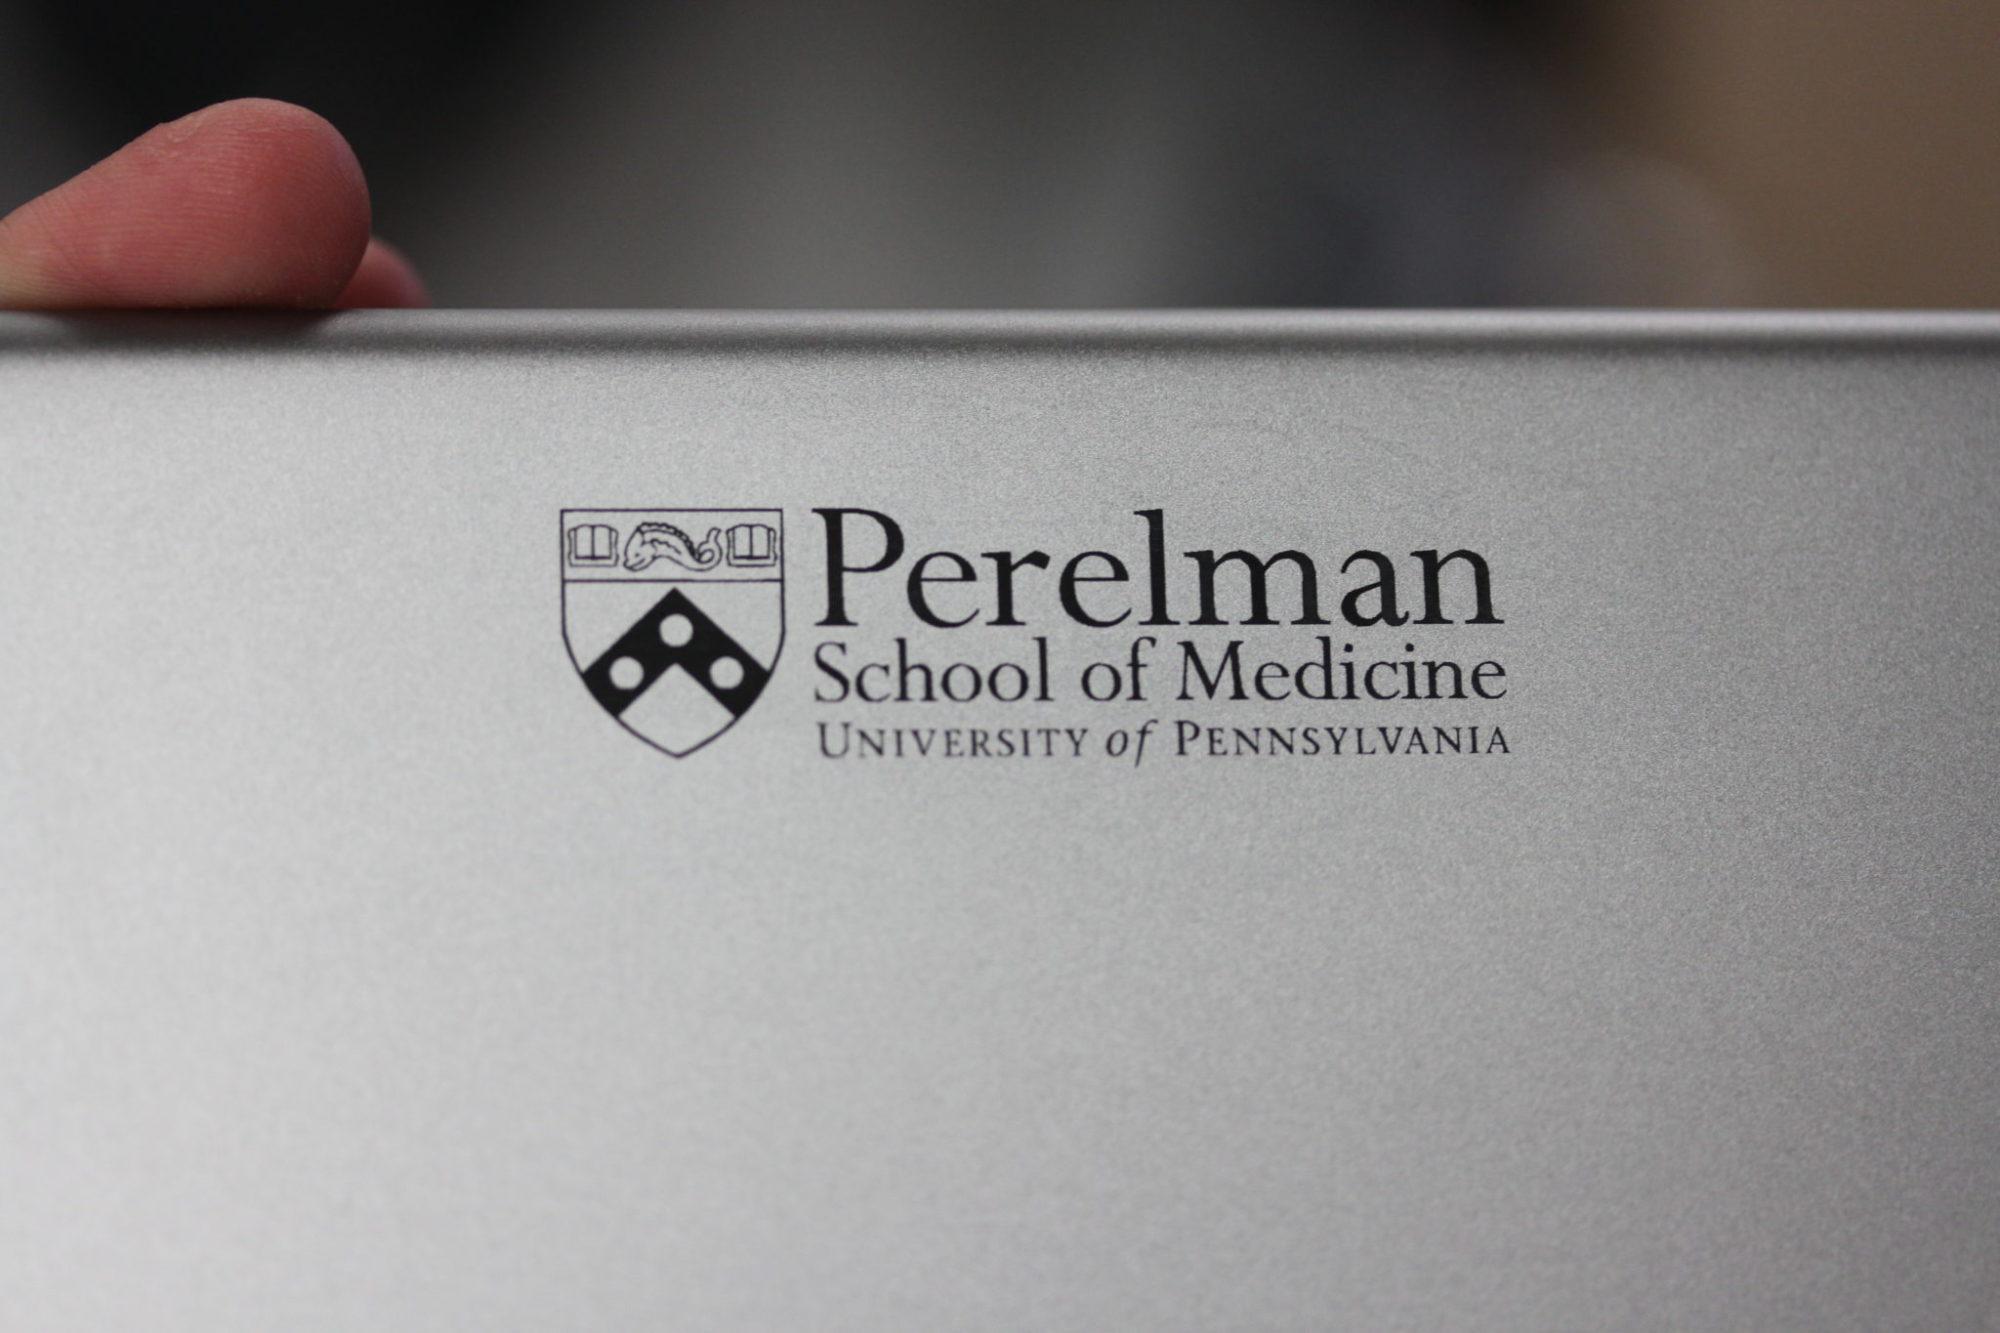 University of Pennsylvania Engraving